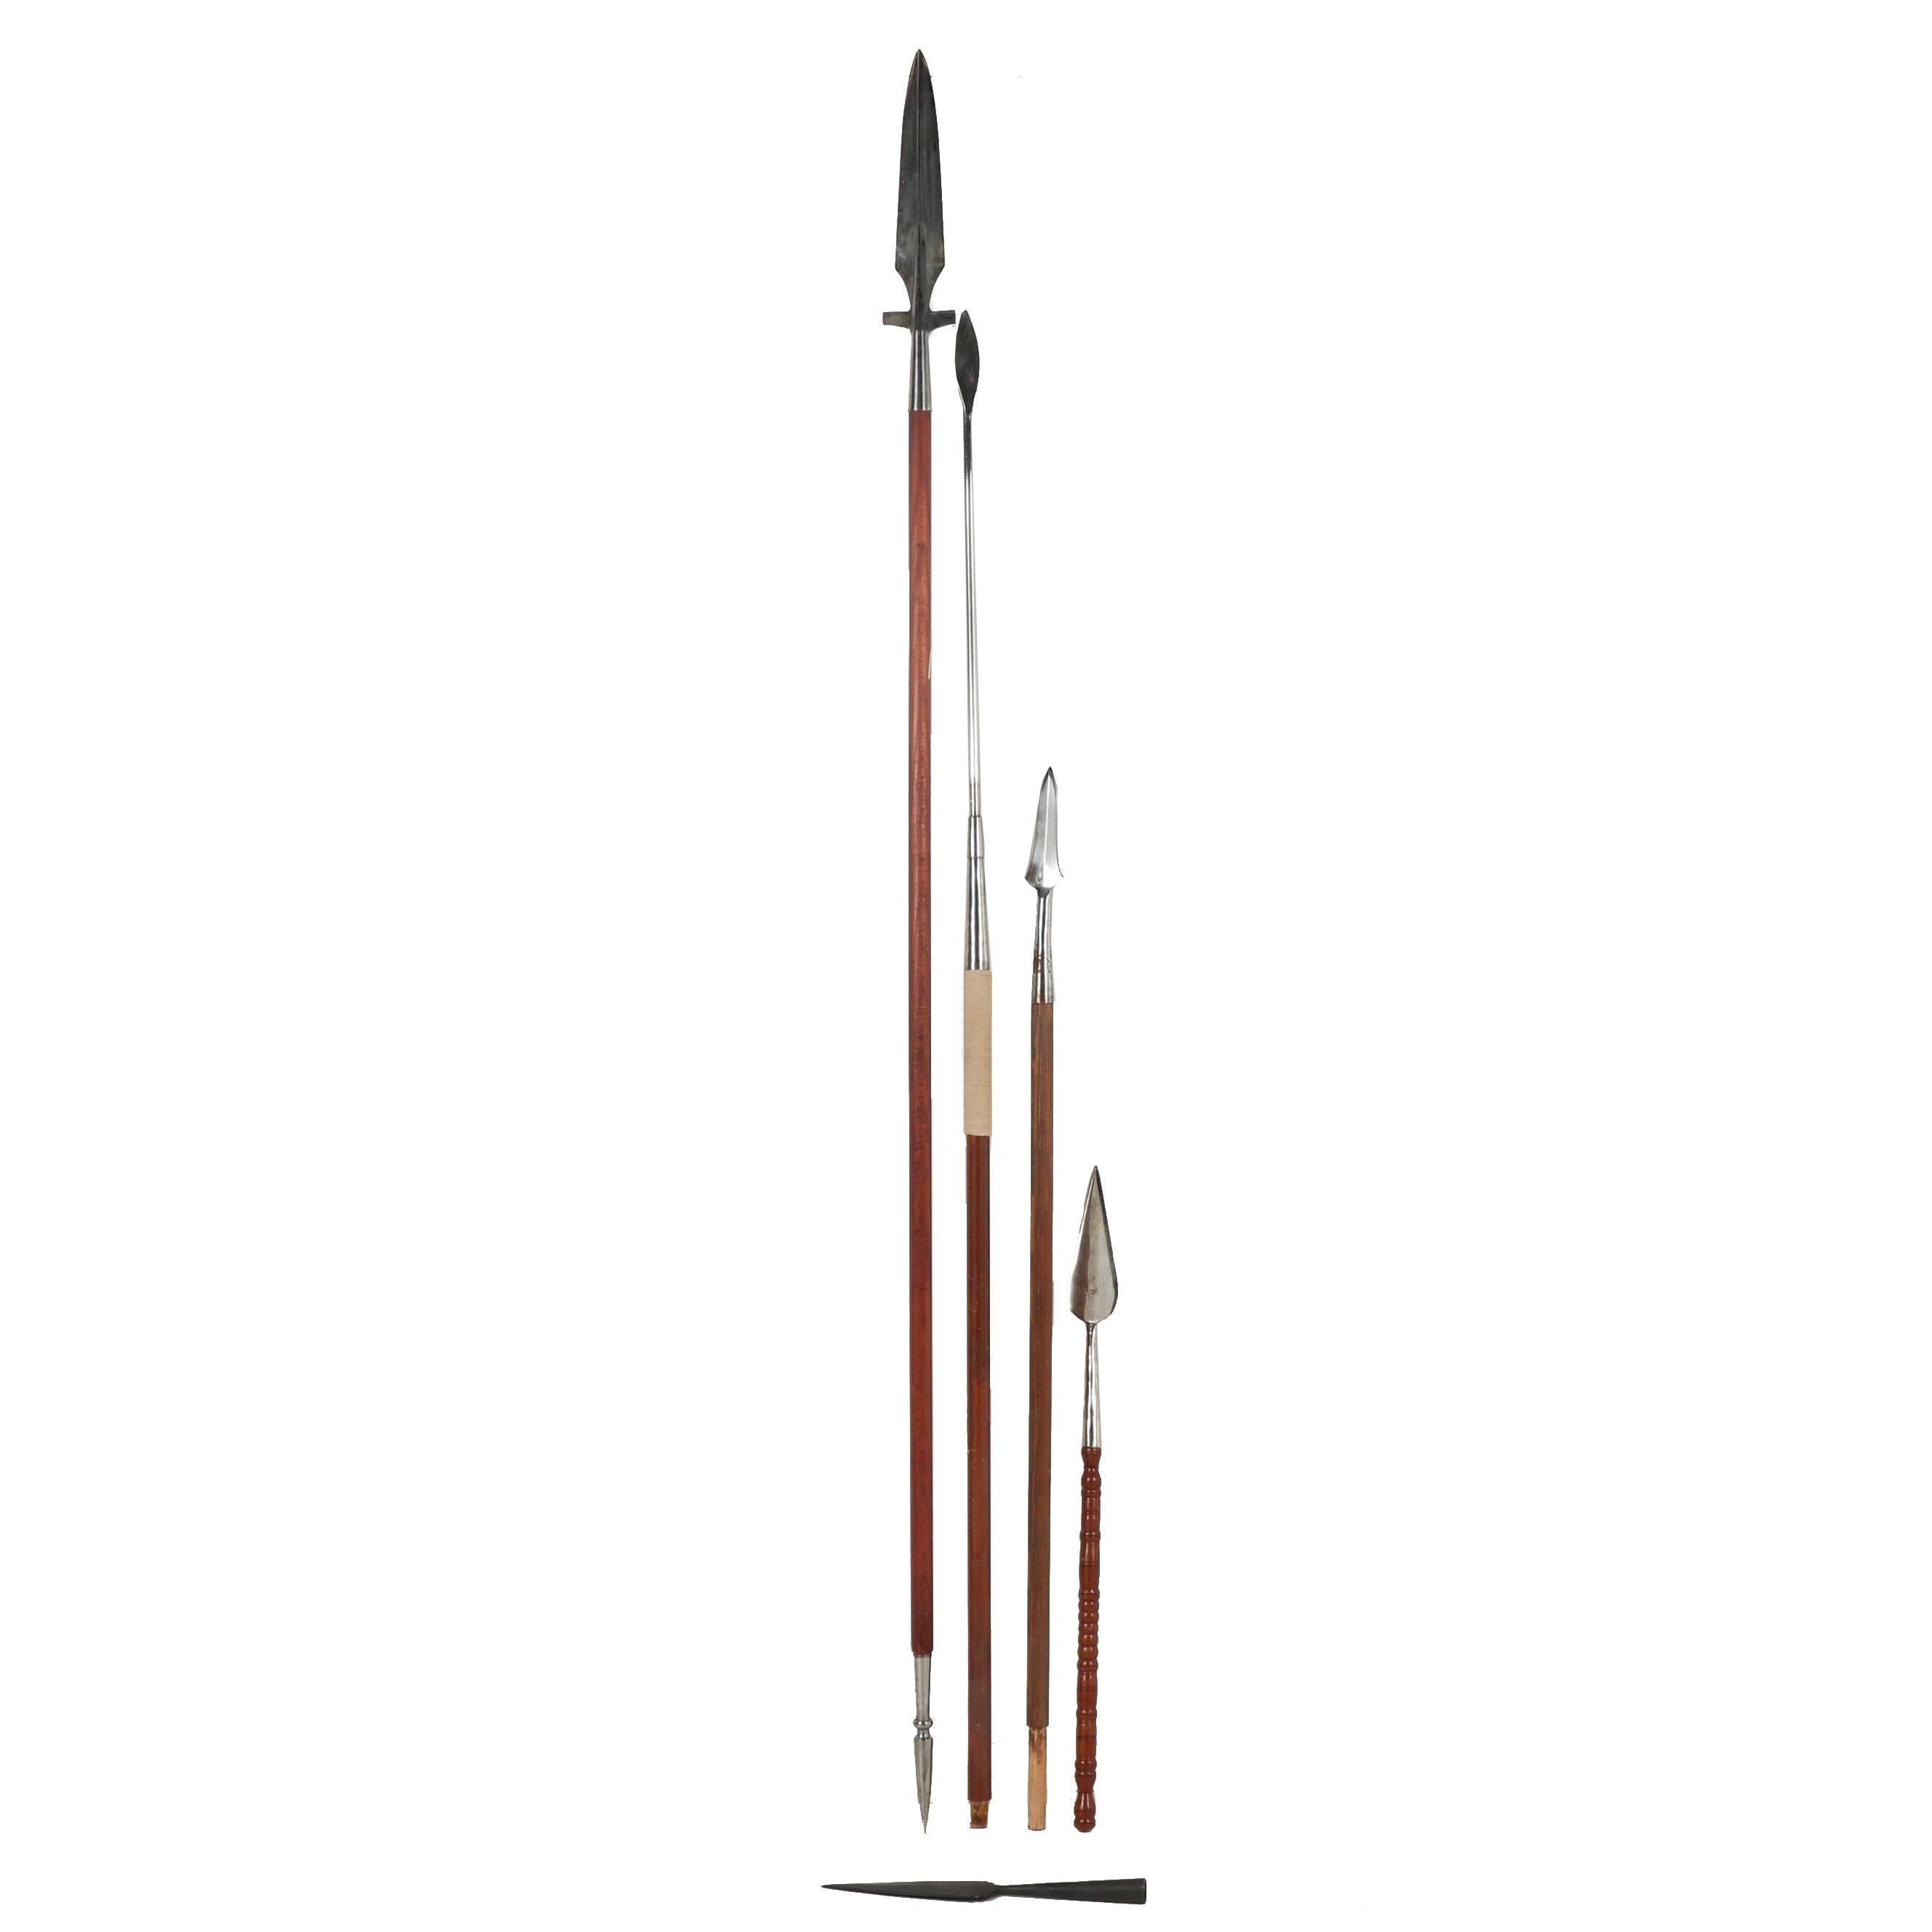 Reproduction Spear, War Darts and Pilum